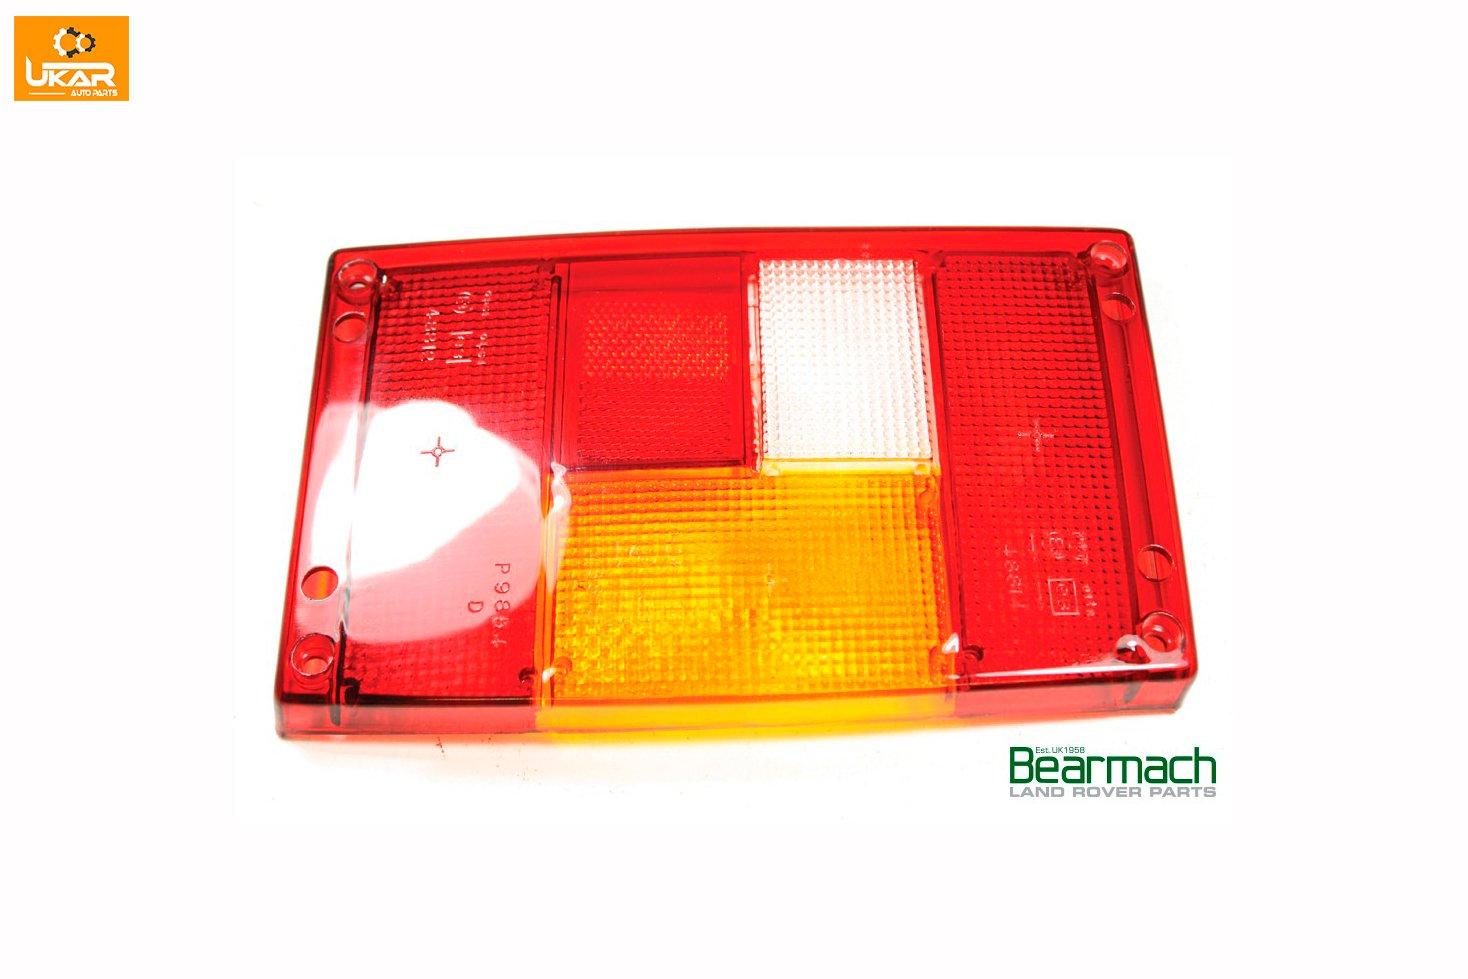 BEARMACH UK Land Rover Range Rover Classic Rear Lamp Lens RH Part# BR1495